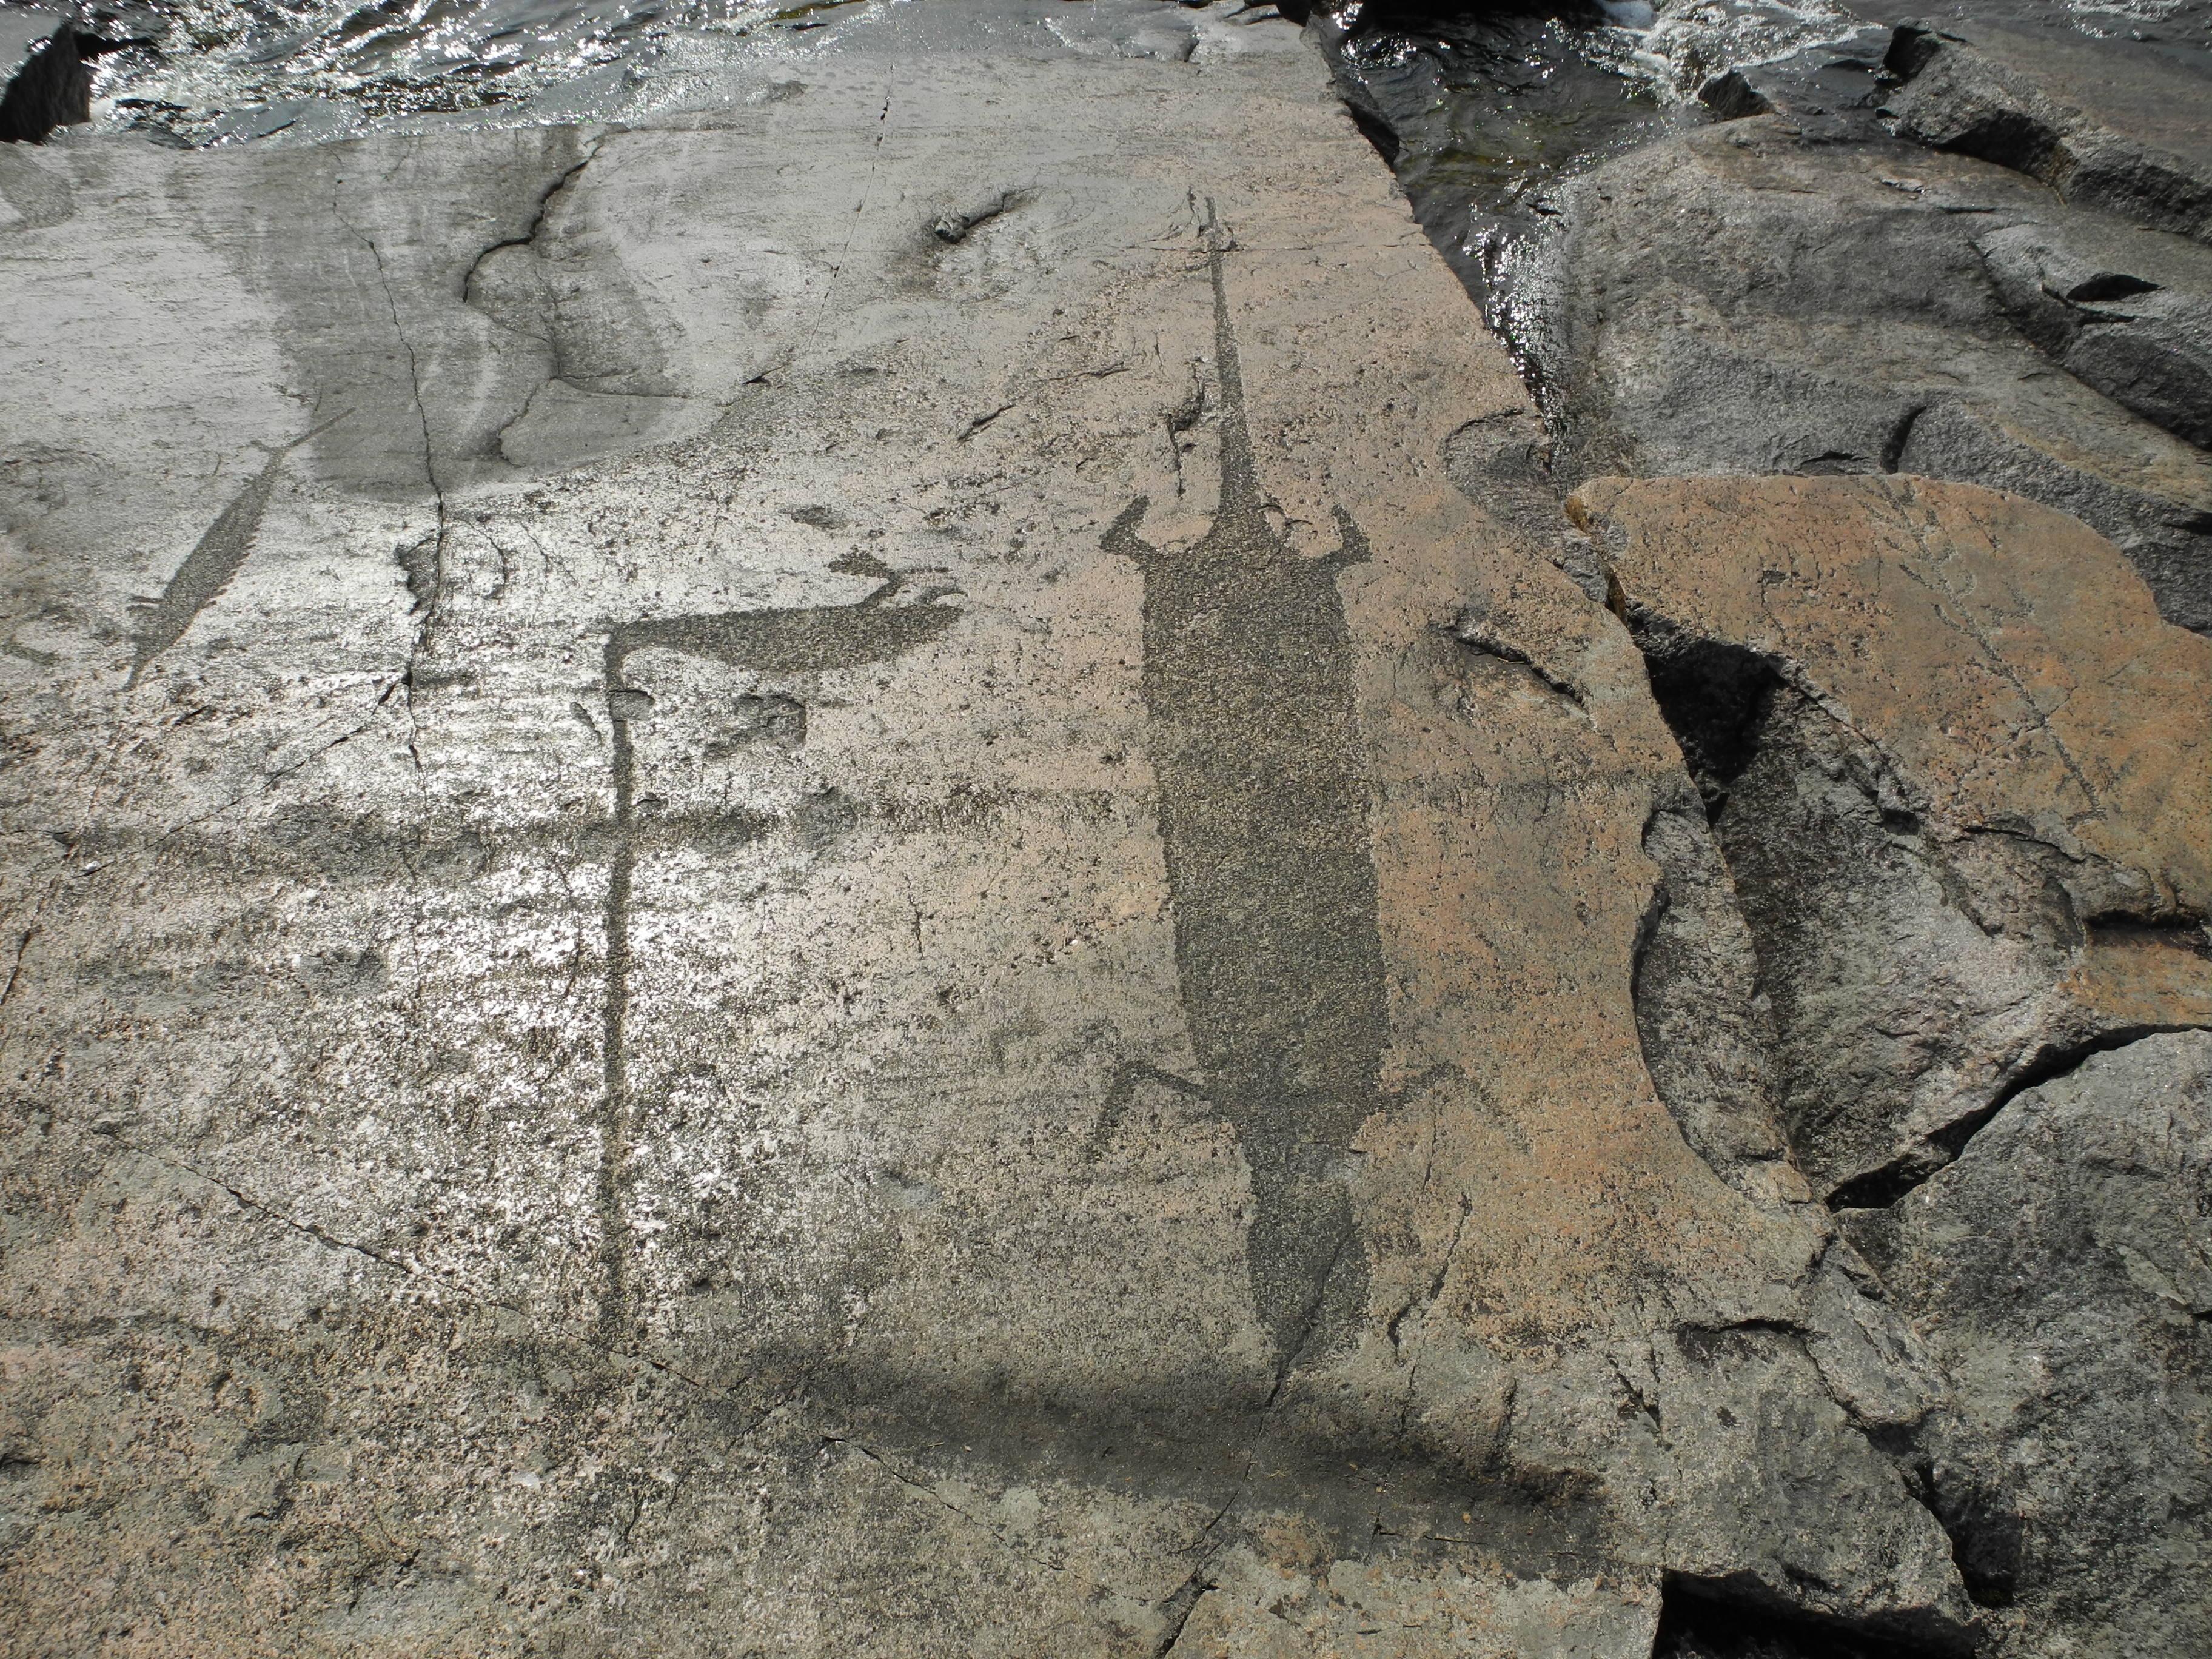 ekskursii-k-onegskim-petroglifam-iasher